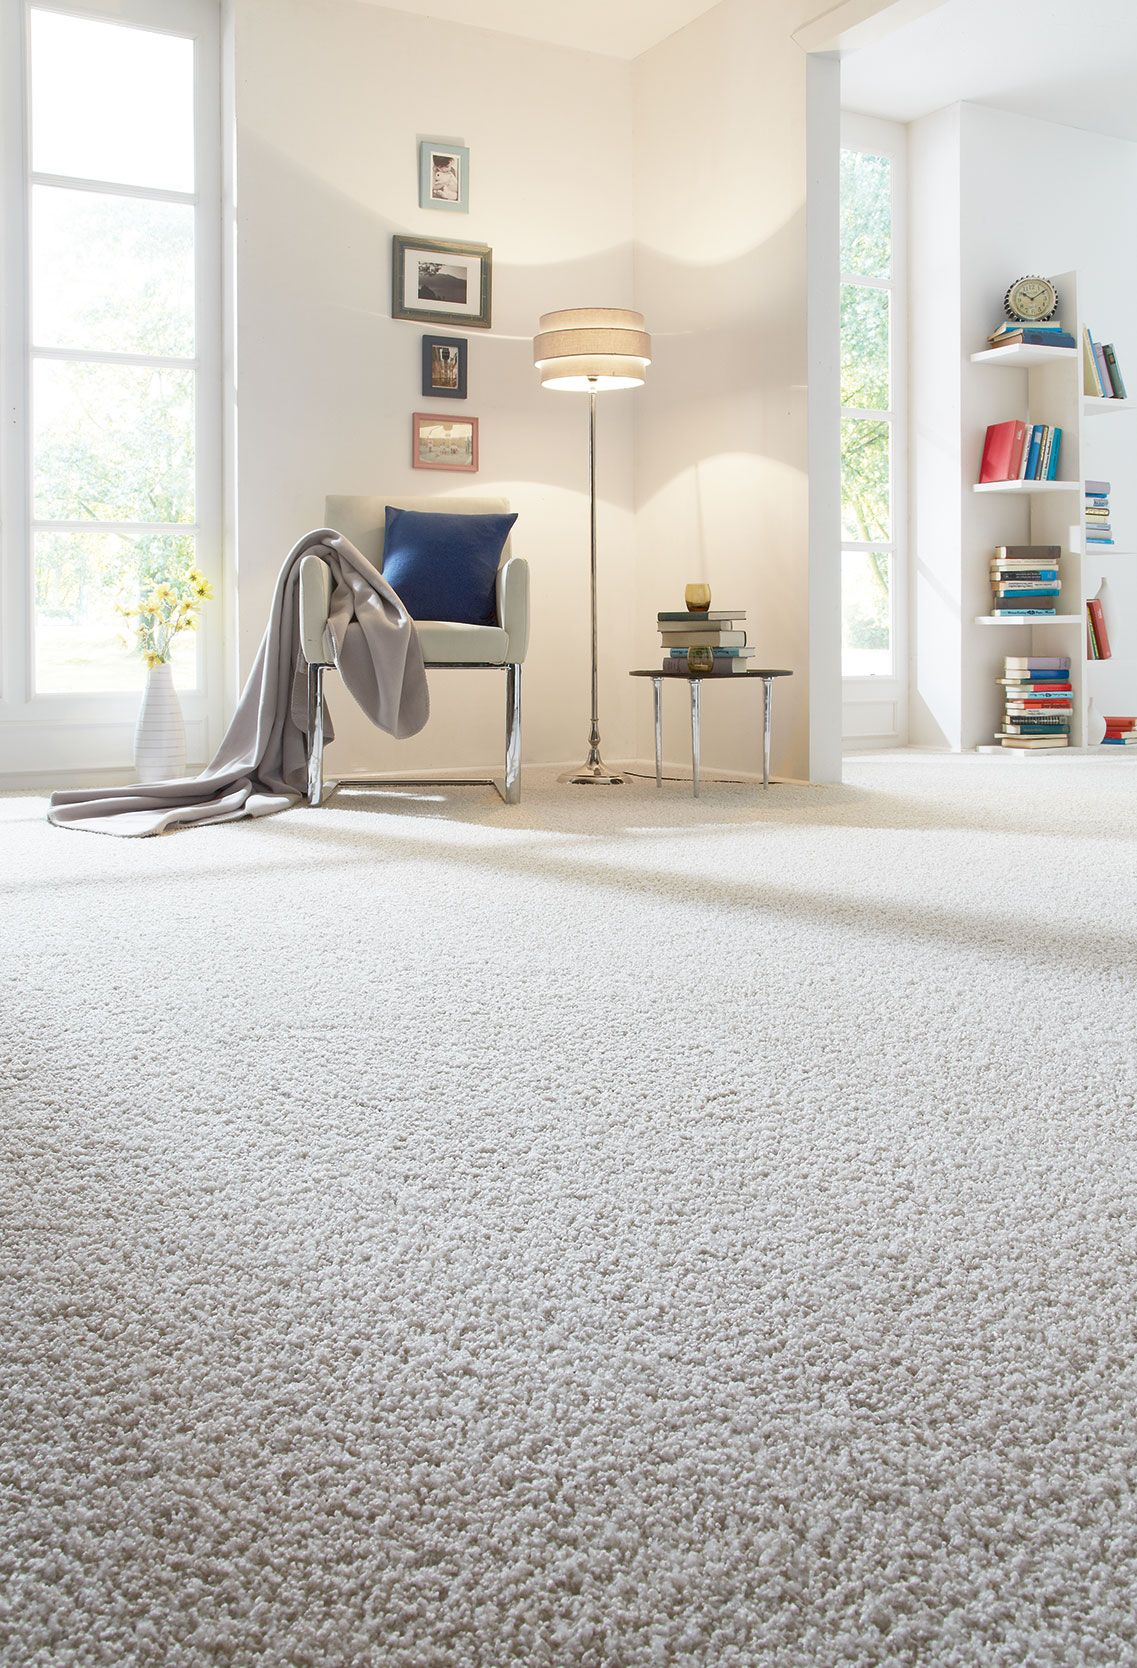 Full Size of Teppichboden Fr Allergiker Besonders Gut Geeignet Teppich Regal Kinderzimmer Weiß Regale Sofa Kinderzimmer Teppichboden Kinderzimmer